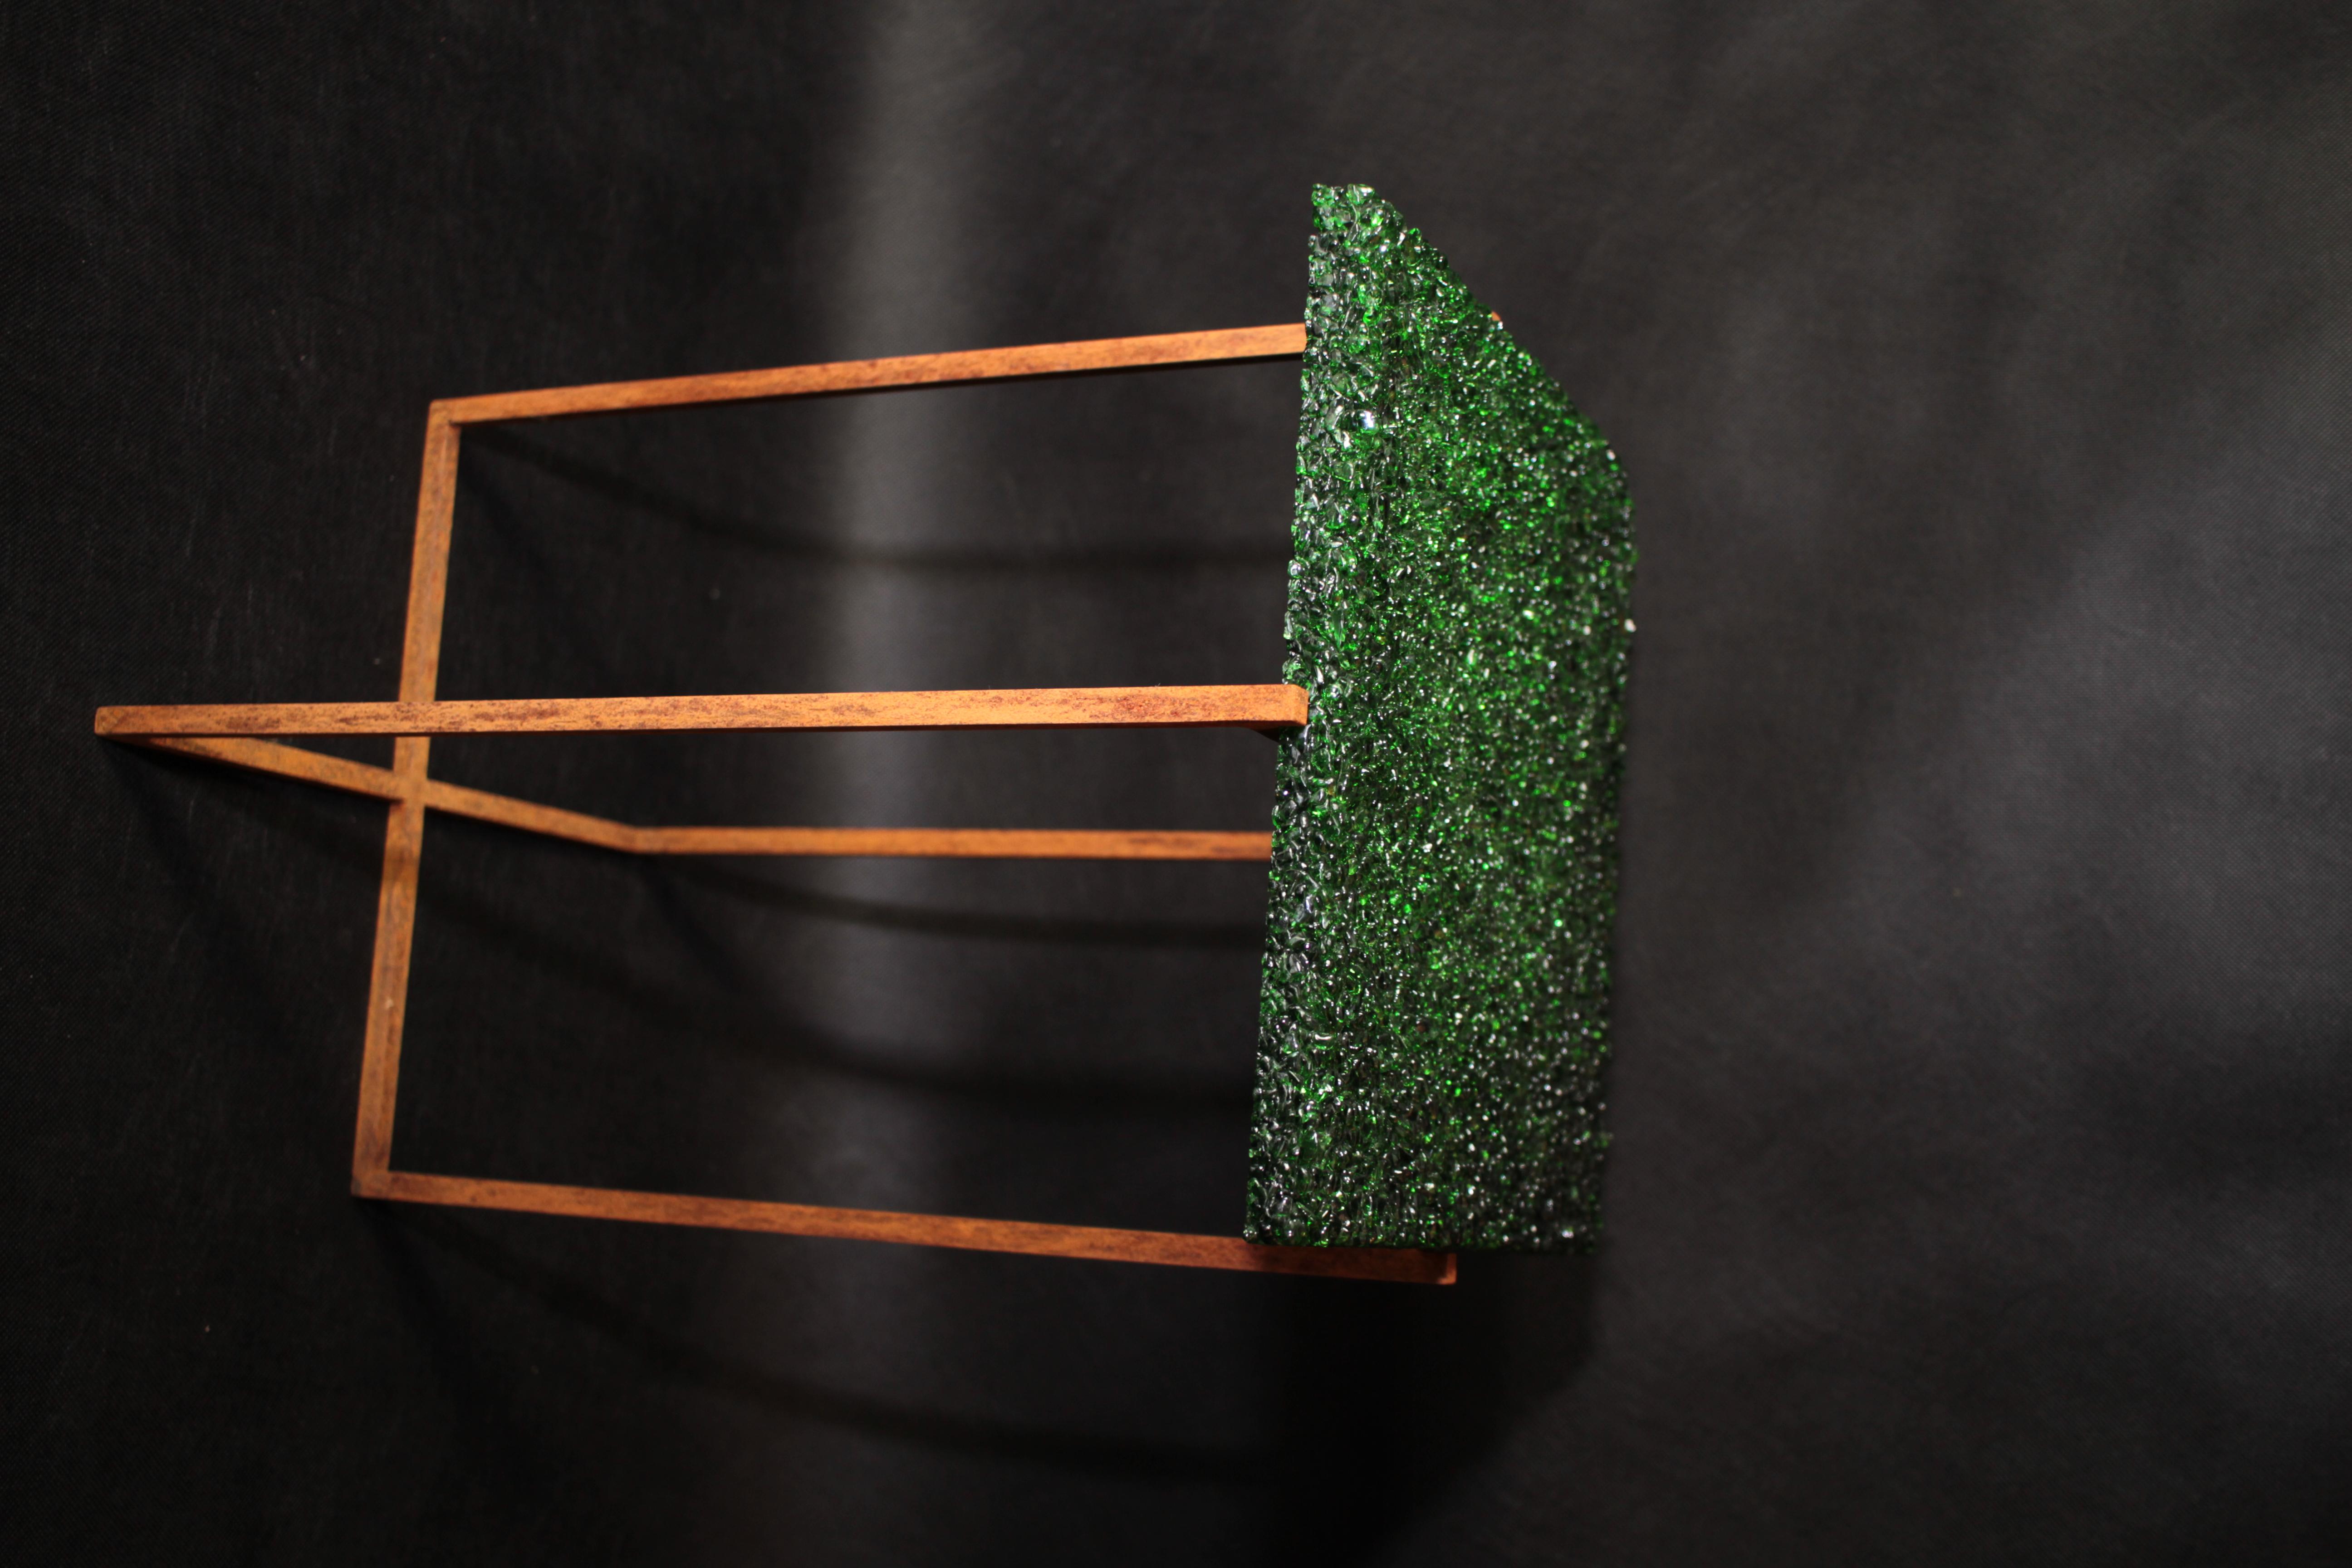 Grass rusty